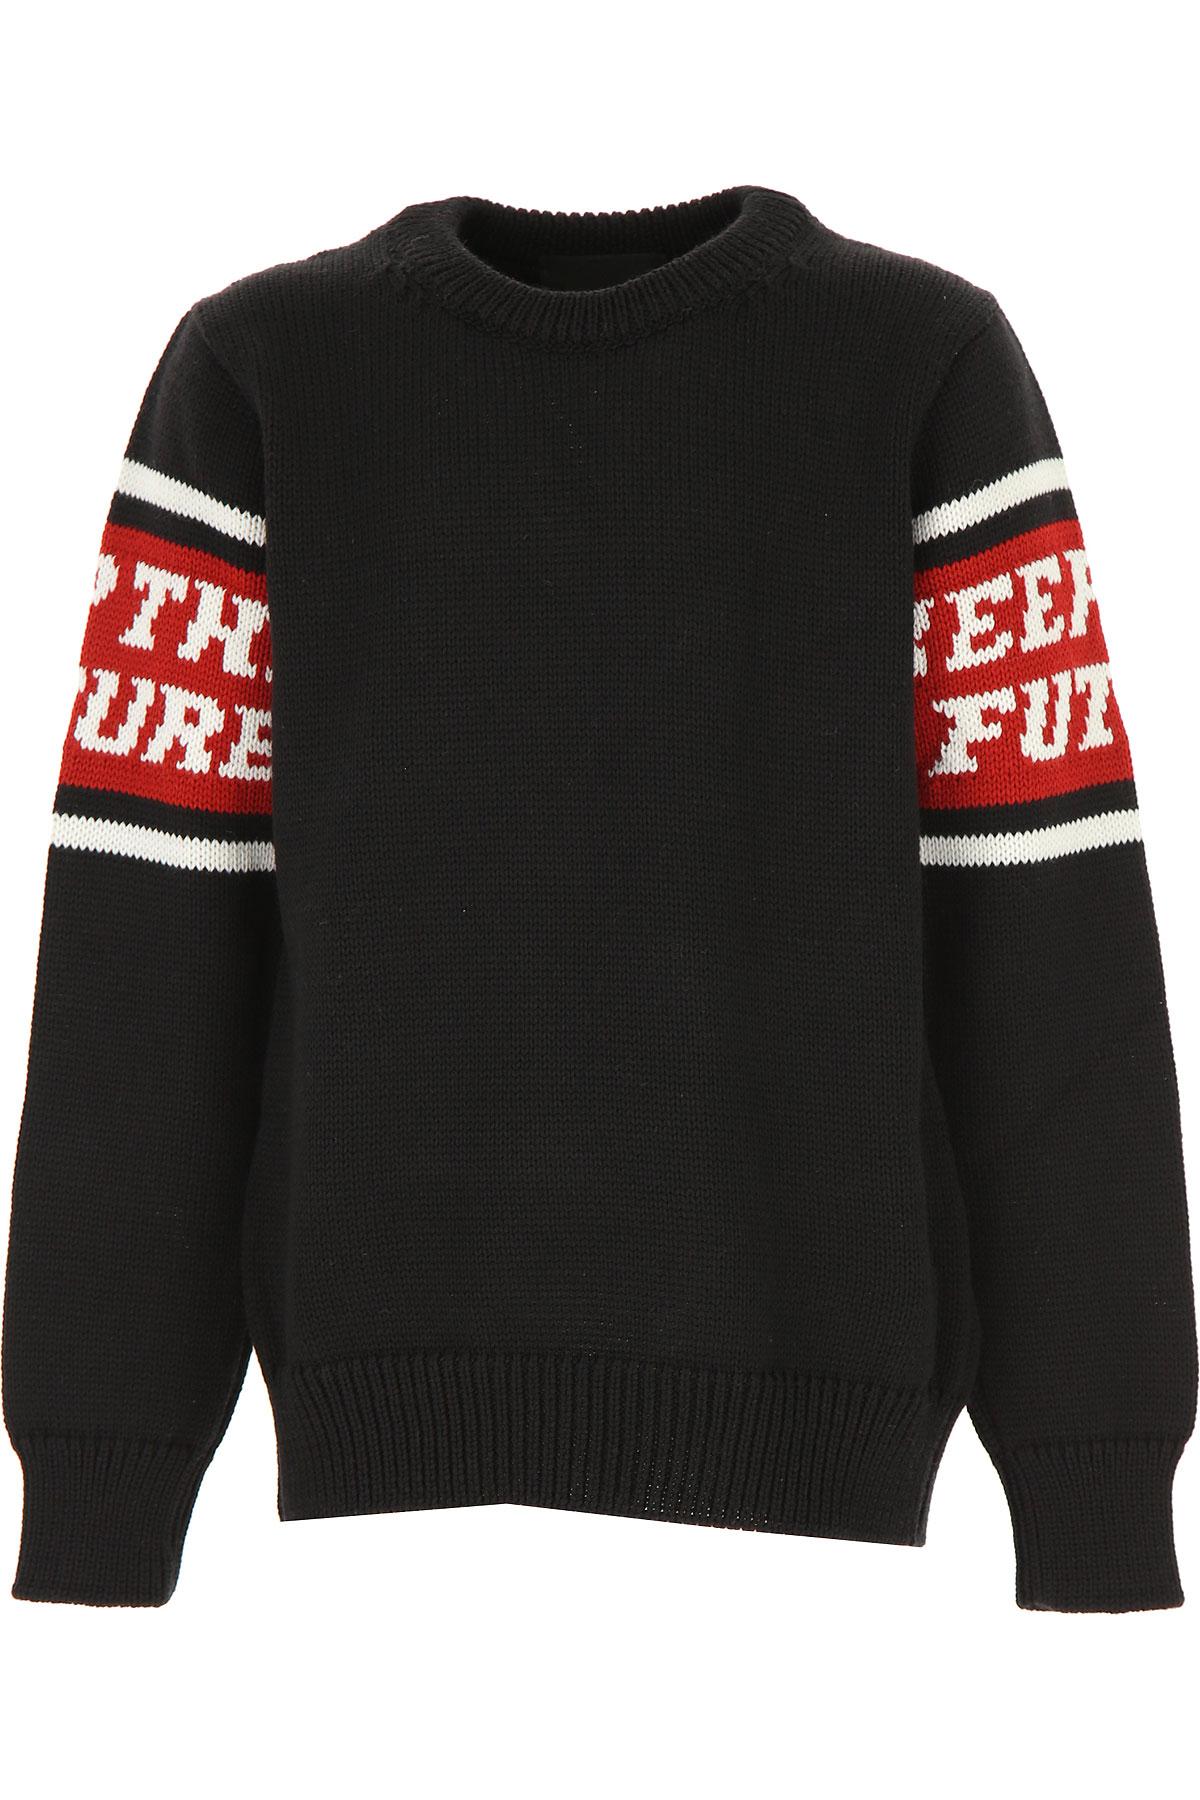 Pyrex Kids Sweaters for Boys On Sale, Black, Wool, 2019, L M S XL XS XXL (16 Y)